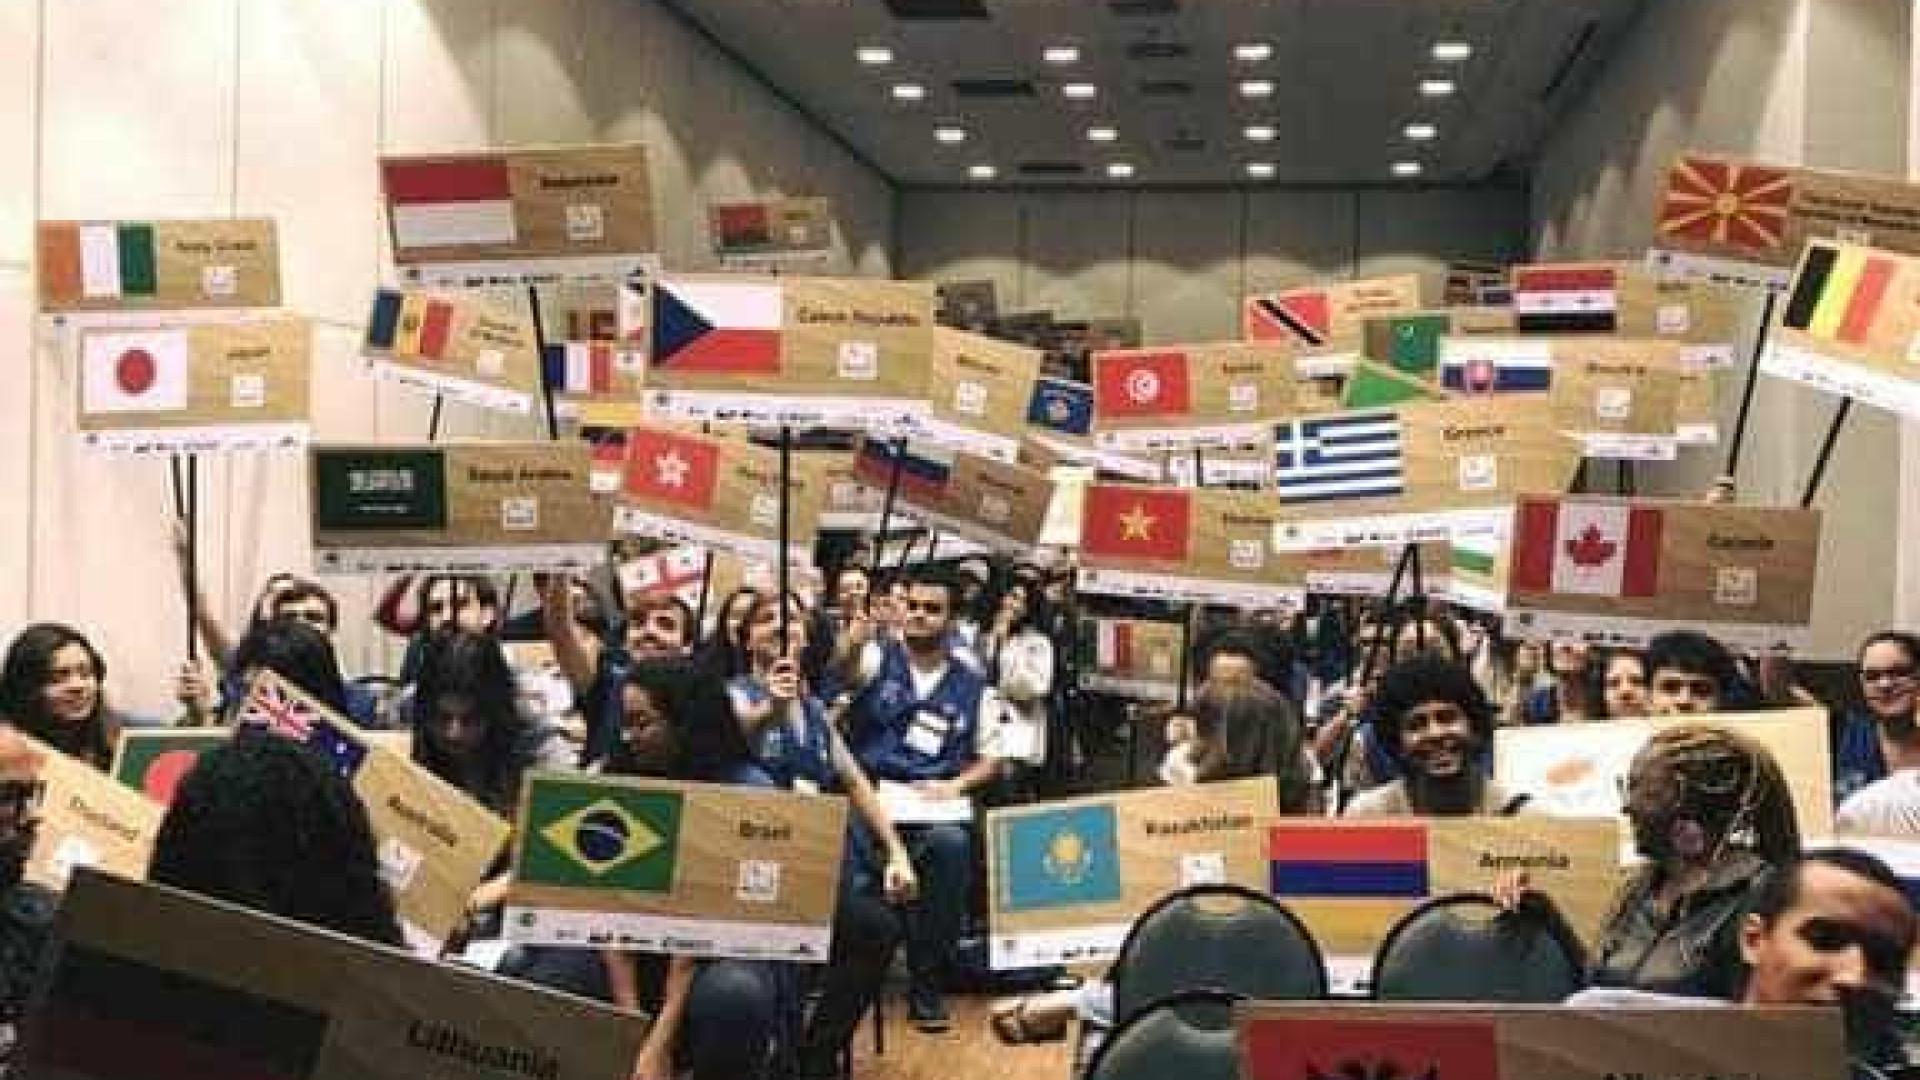 Olimpíada Internacional de Matemática começa nesta segunda no Rio